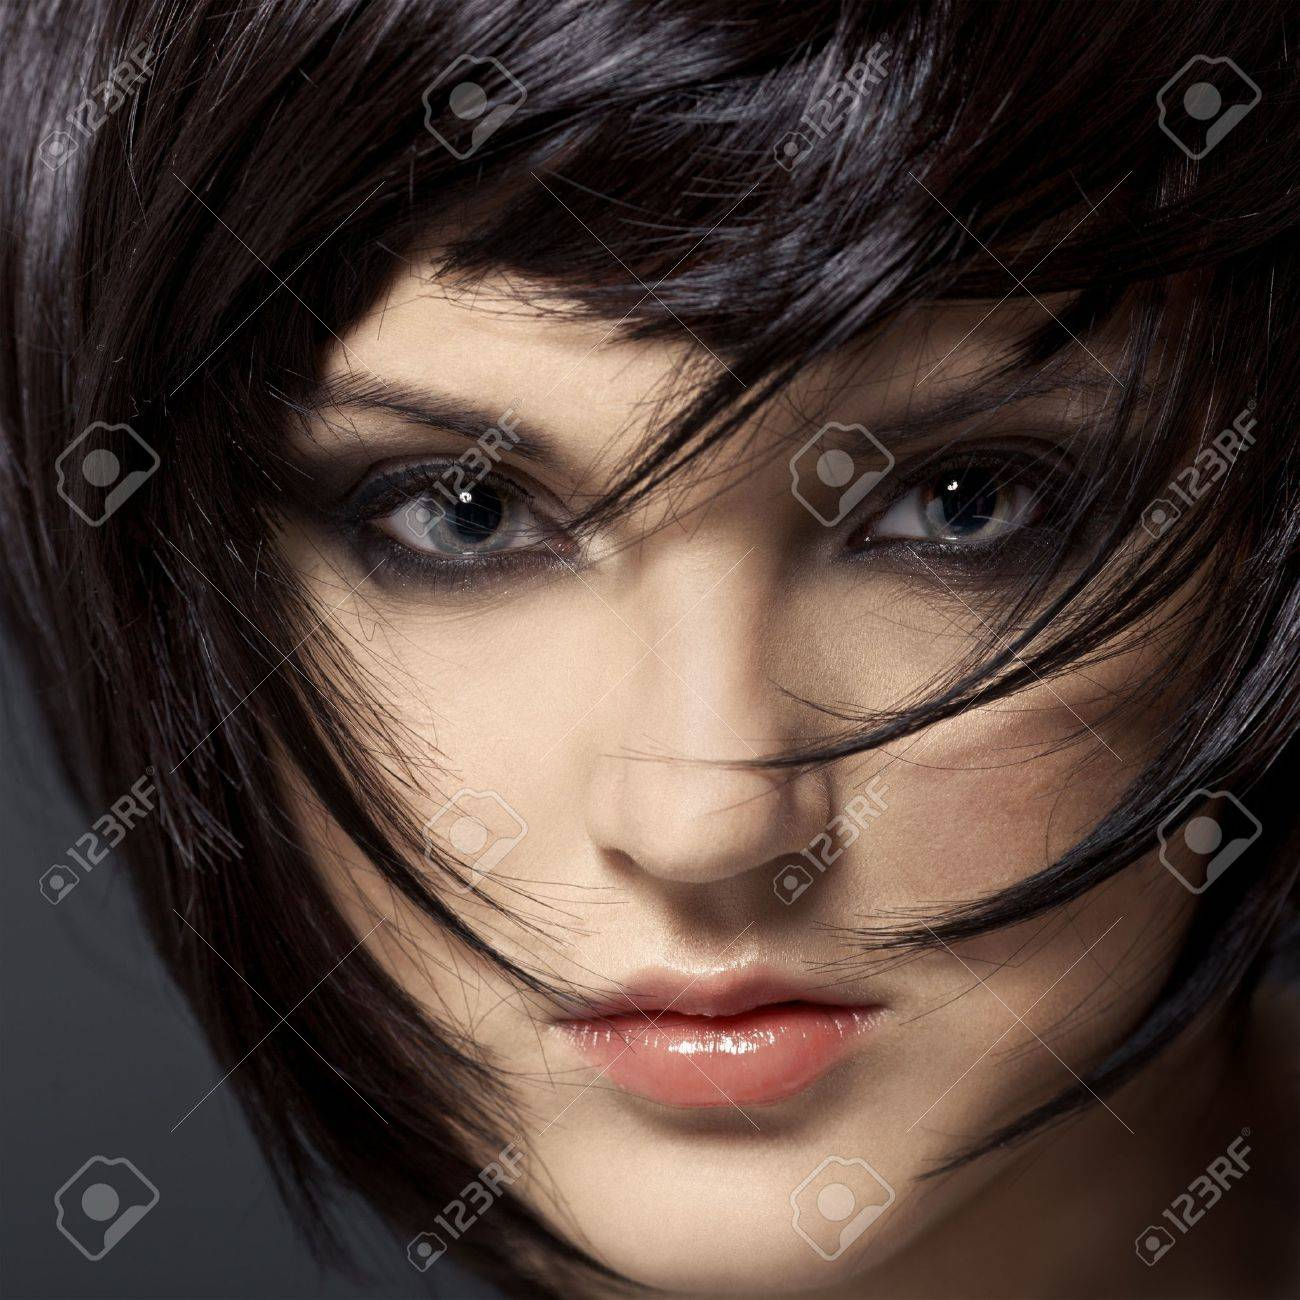 Strange Beautiful Brunette Girl Healthy Hair Hairstyle Stock Photo Short Hairstyles For Black Women Fulllsitofus